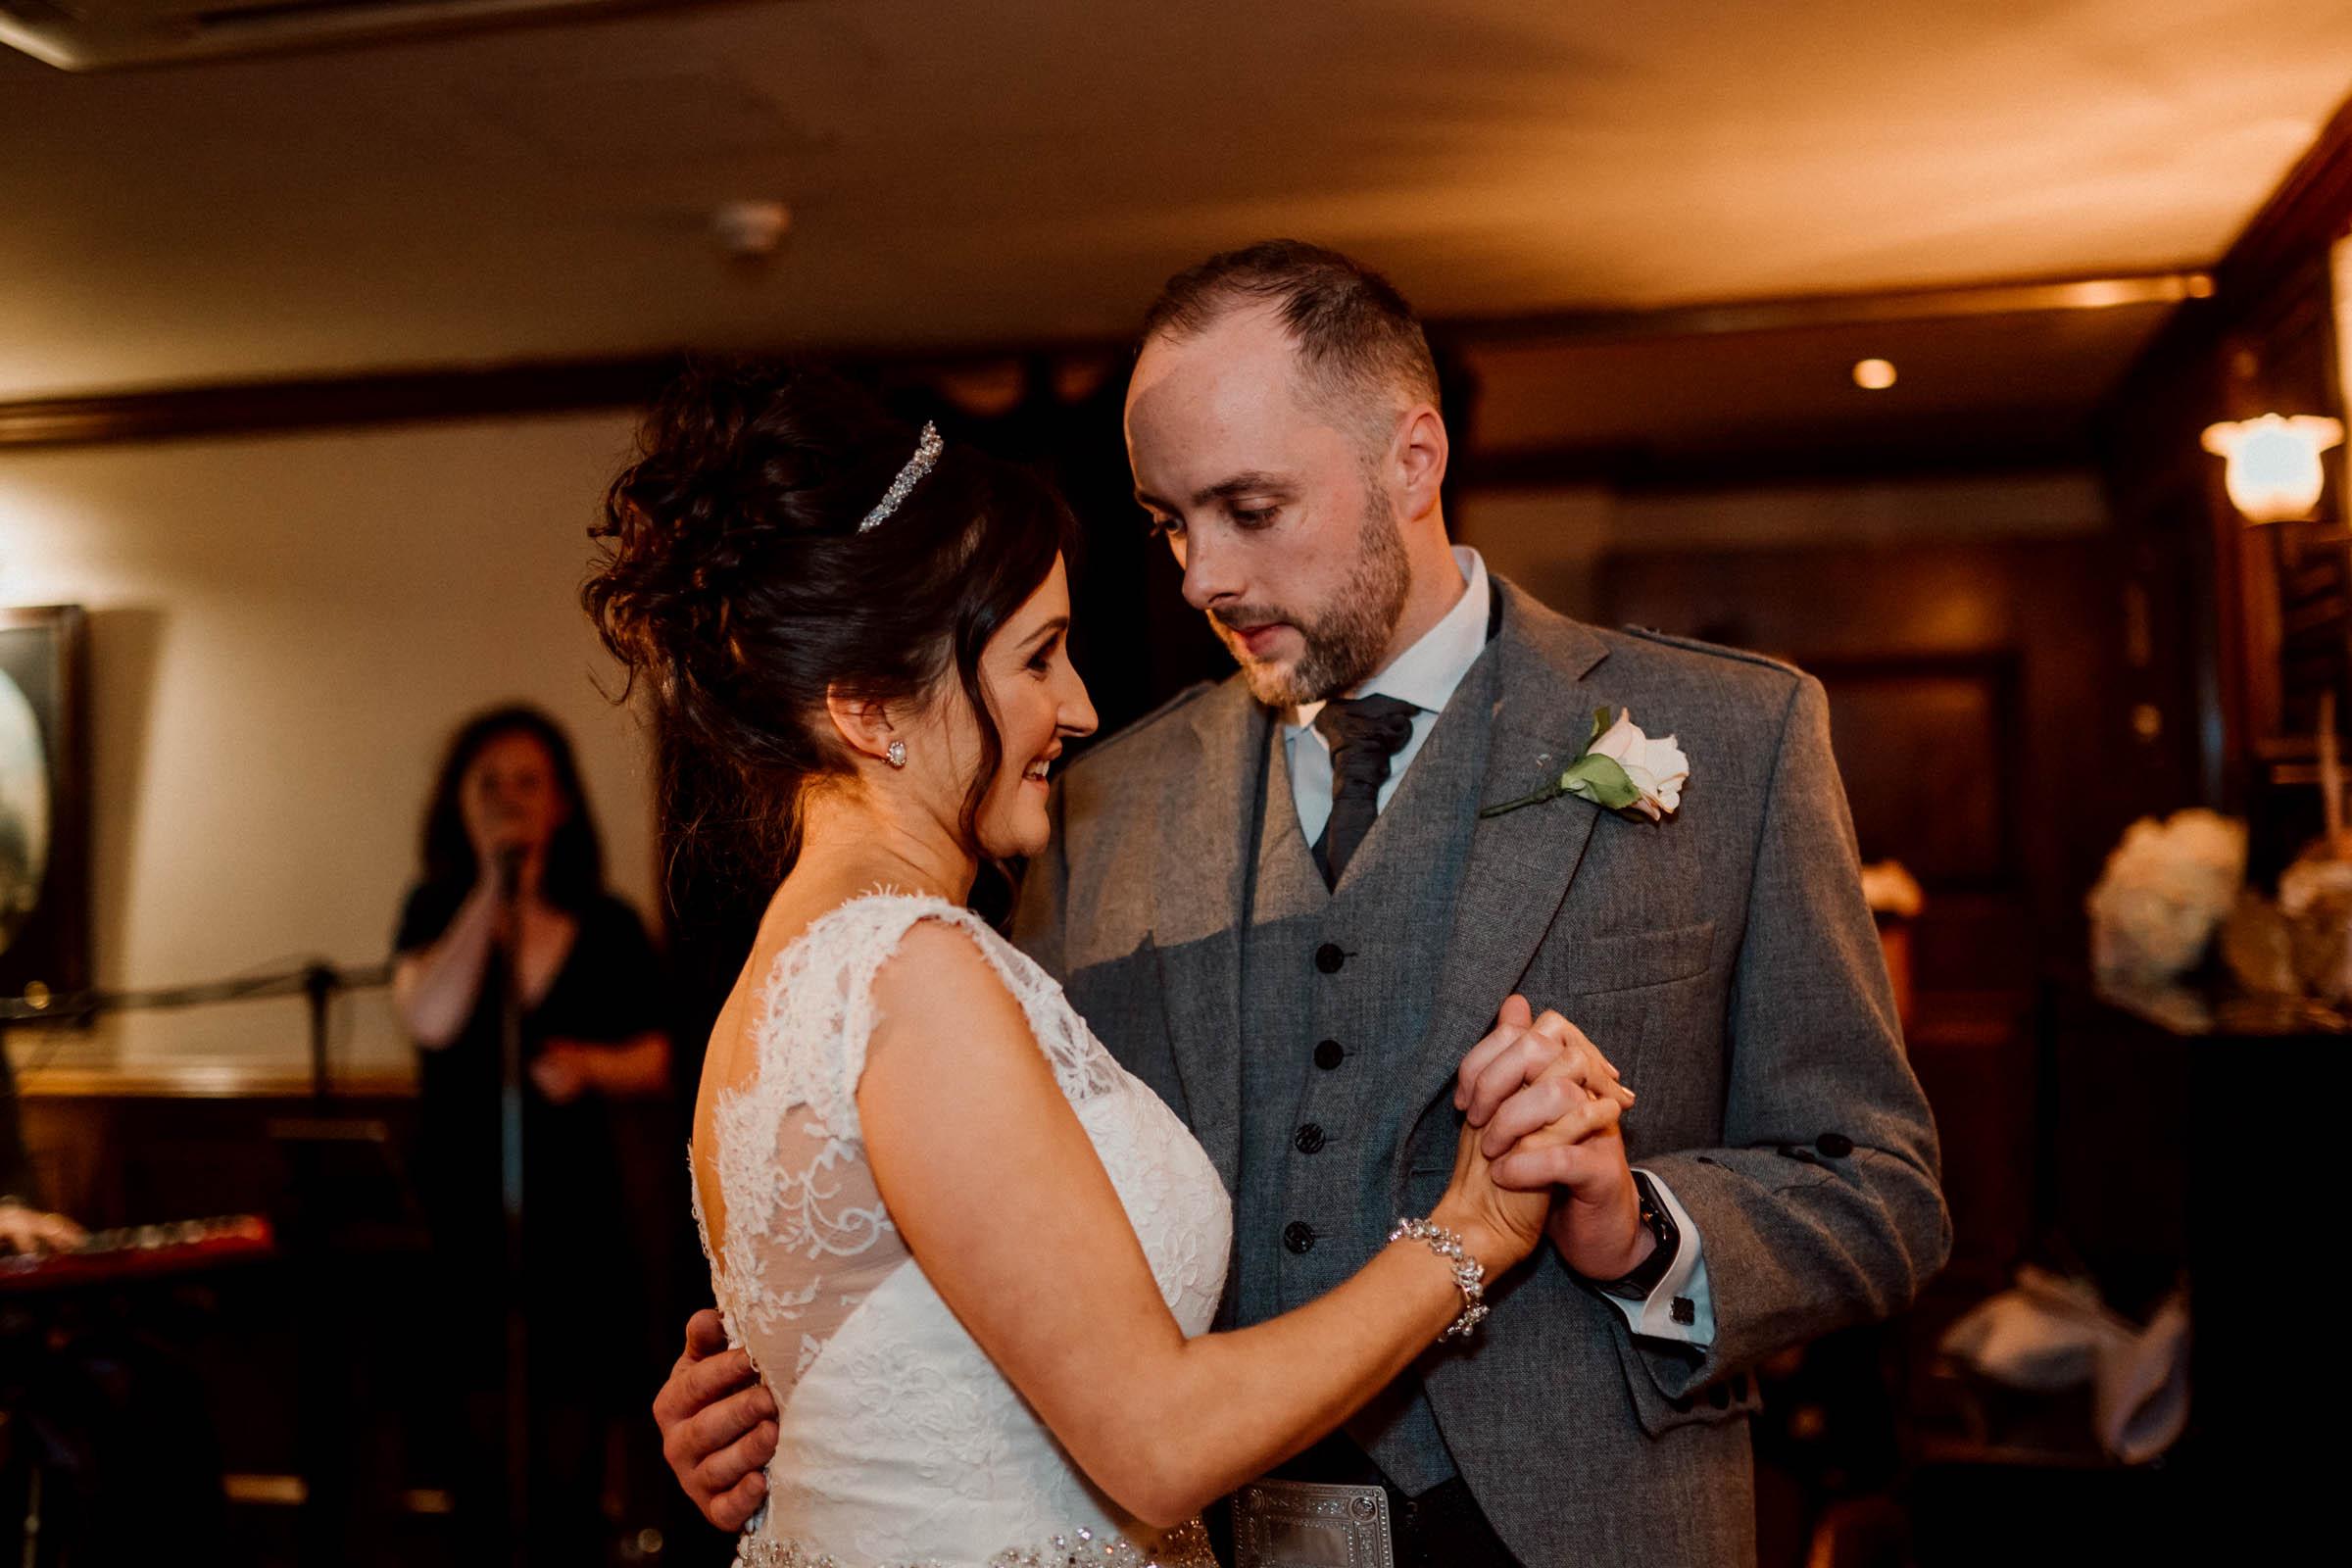 Oran-Mor-Wedding-Photographer-DearlyPhotography (46 of 55).jpg